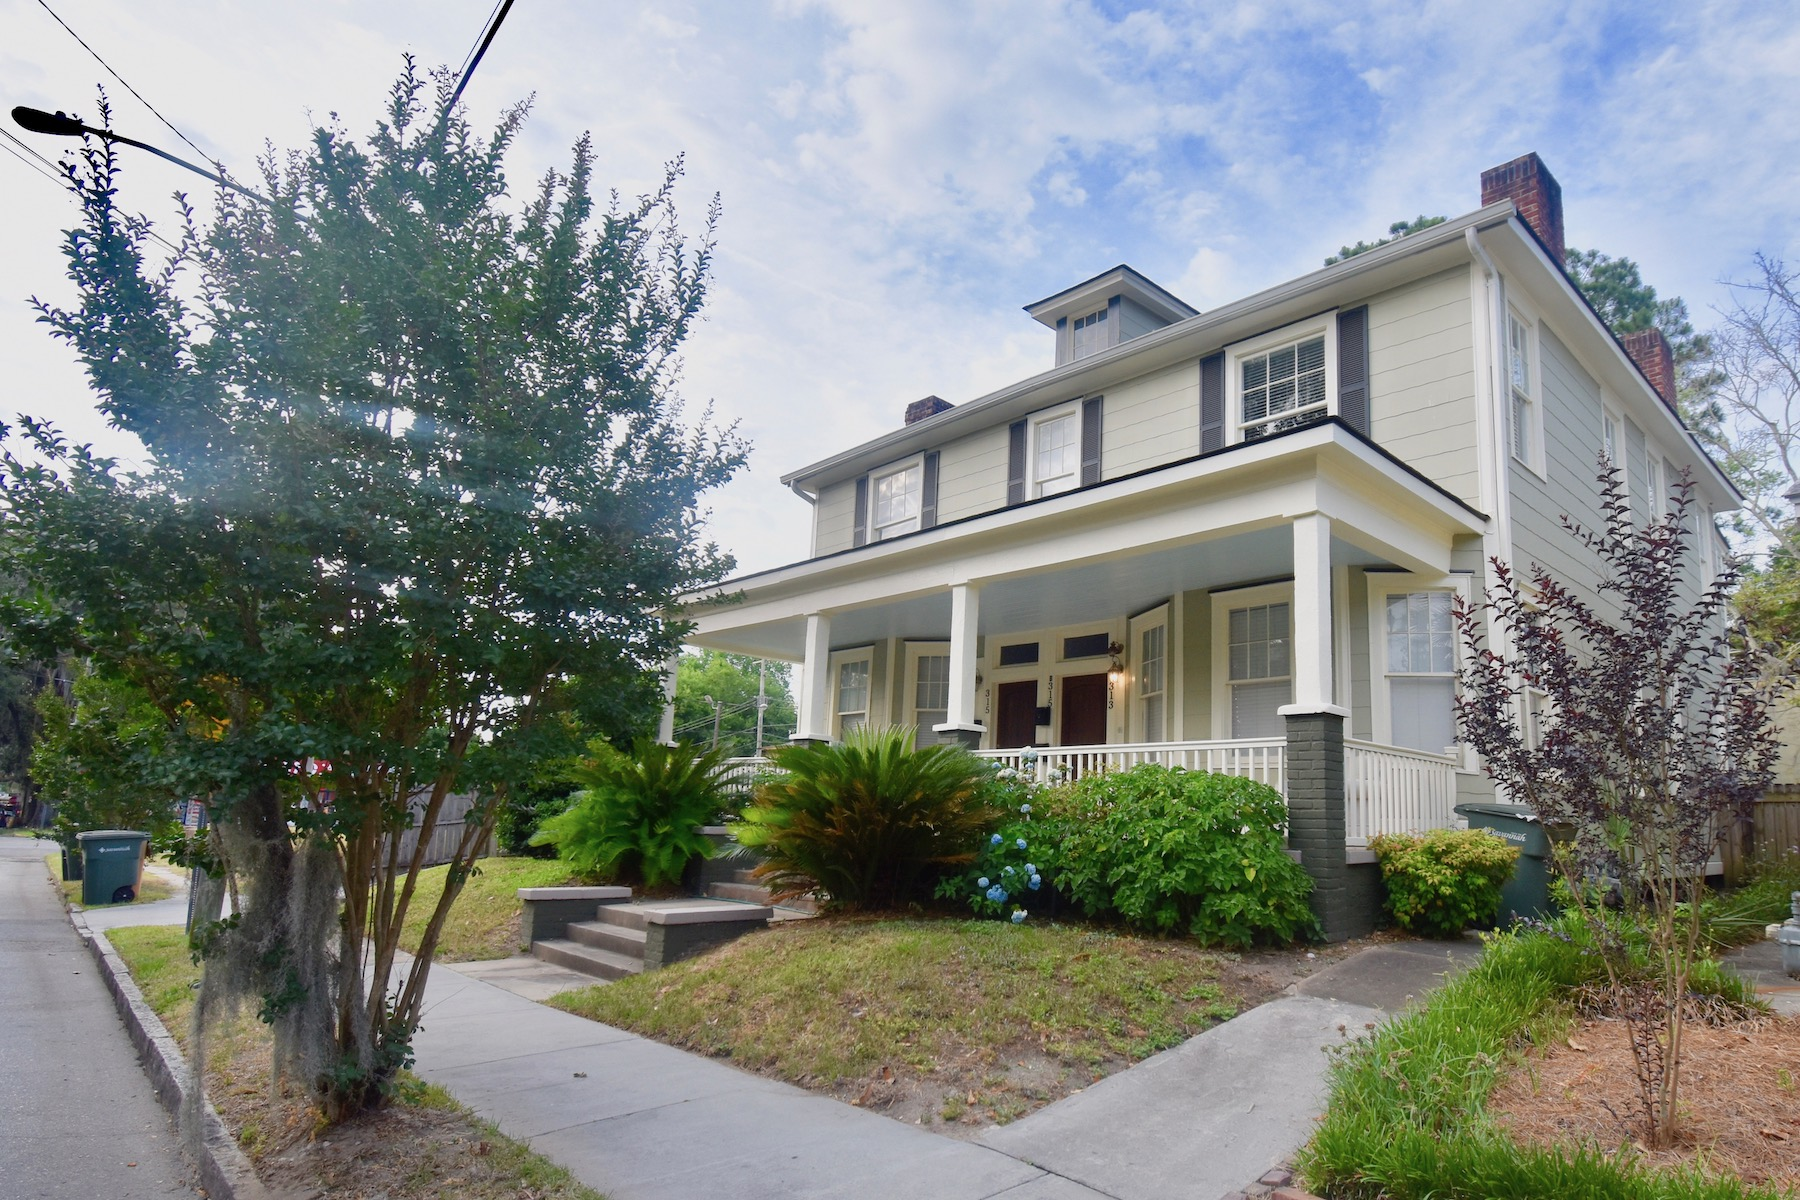 Property для того Продажа на 315 E. 38th Street #B Unit 3 315 East 38th #B Unit 3, Savannah, Джорджия 31401 Соединенные Штаты